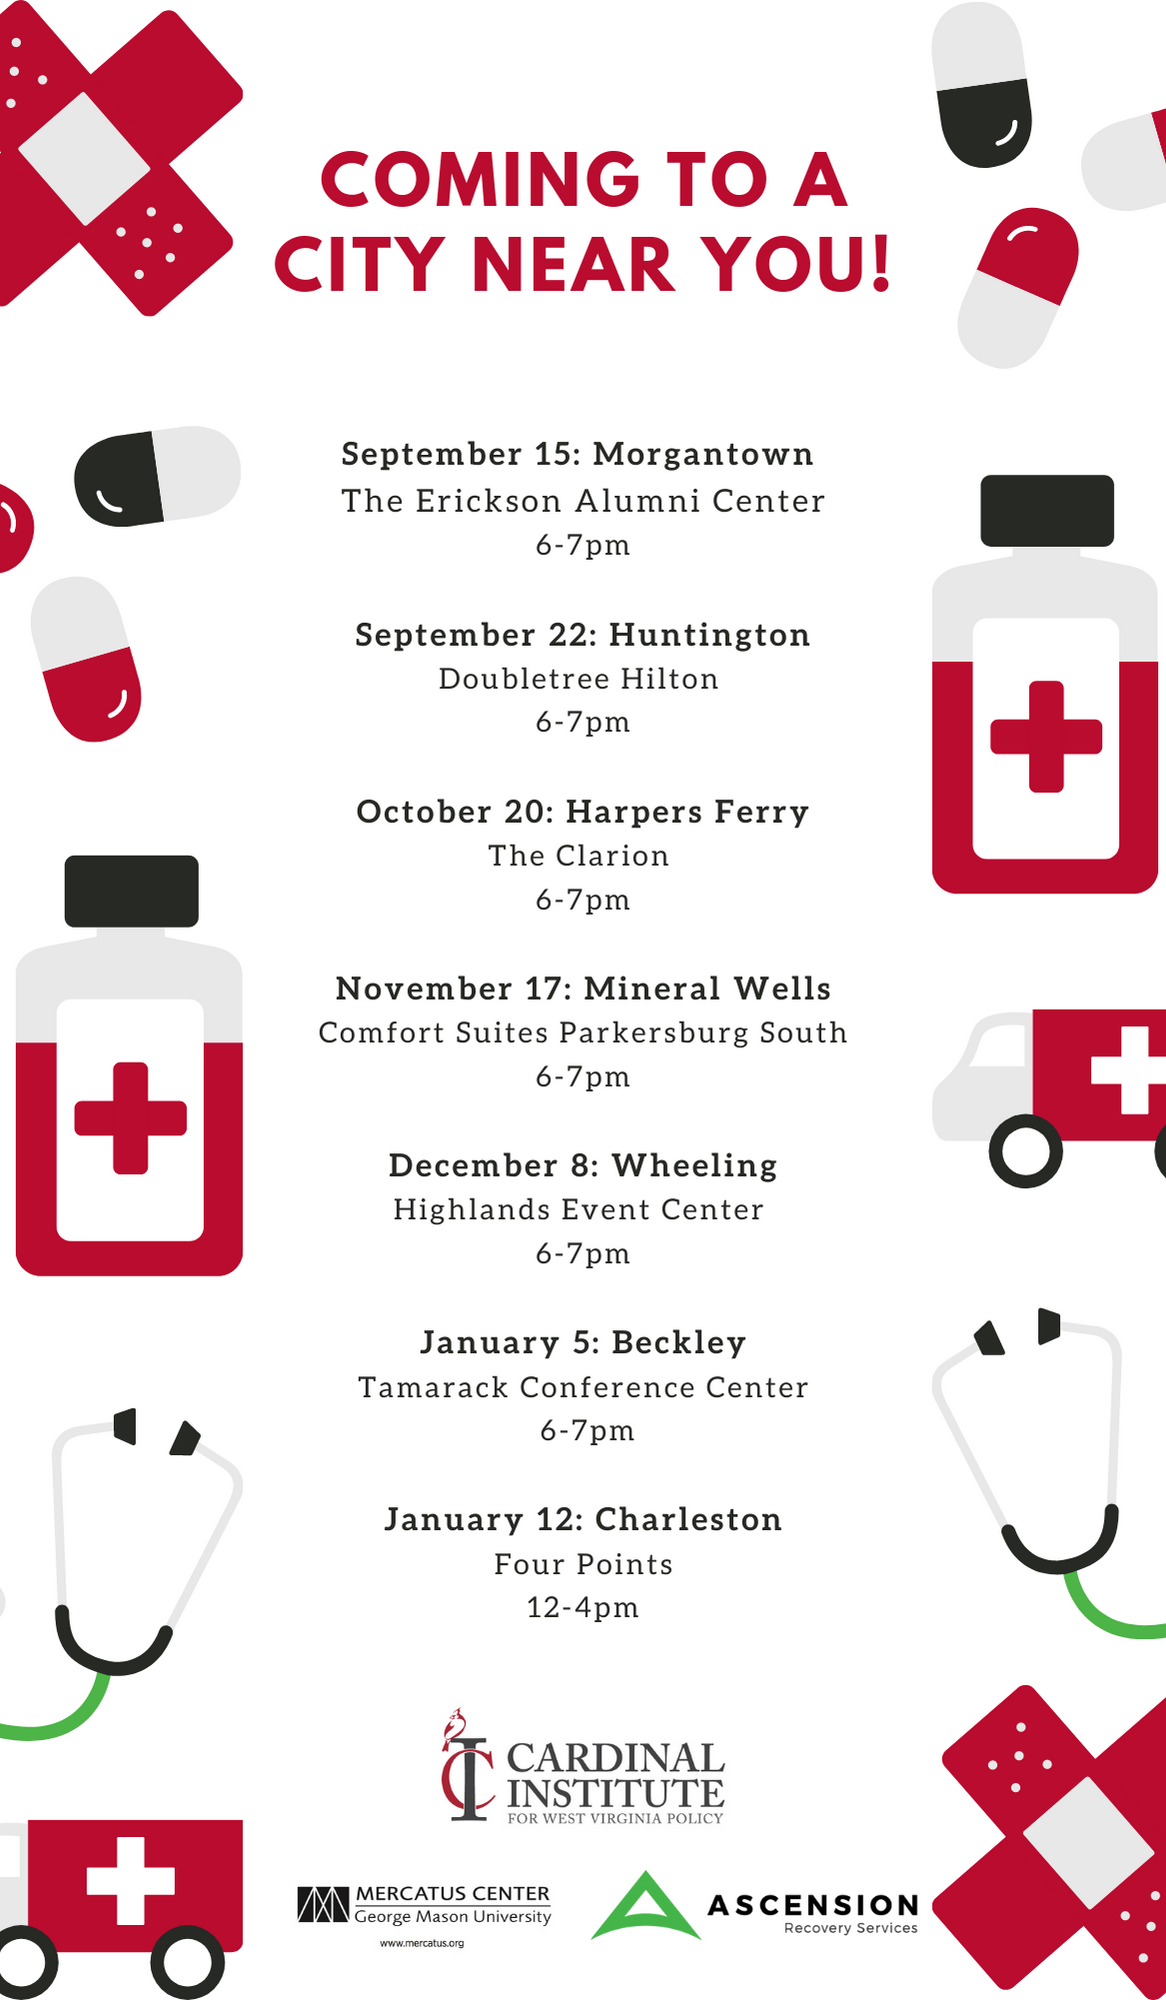 2021 Health Care Tour Locations & Dates